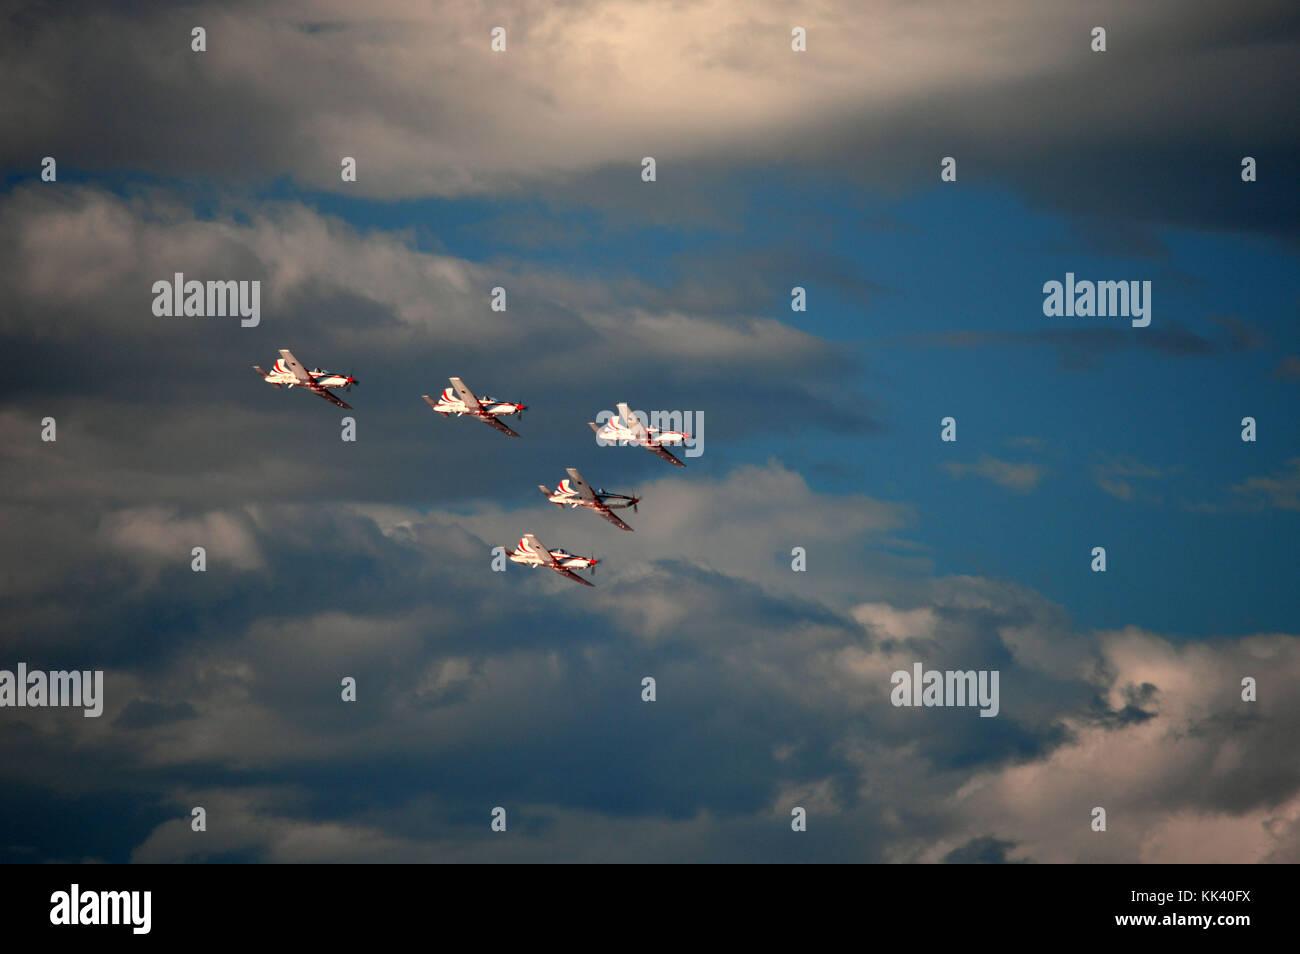 Croatian AF aerobatic team Krila Oluje (Wings of Storm) in a formation over Šibenik Croatia - Stock Image